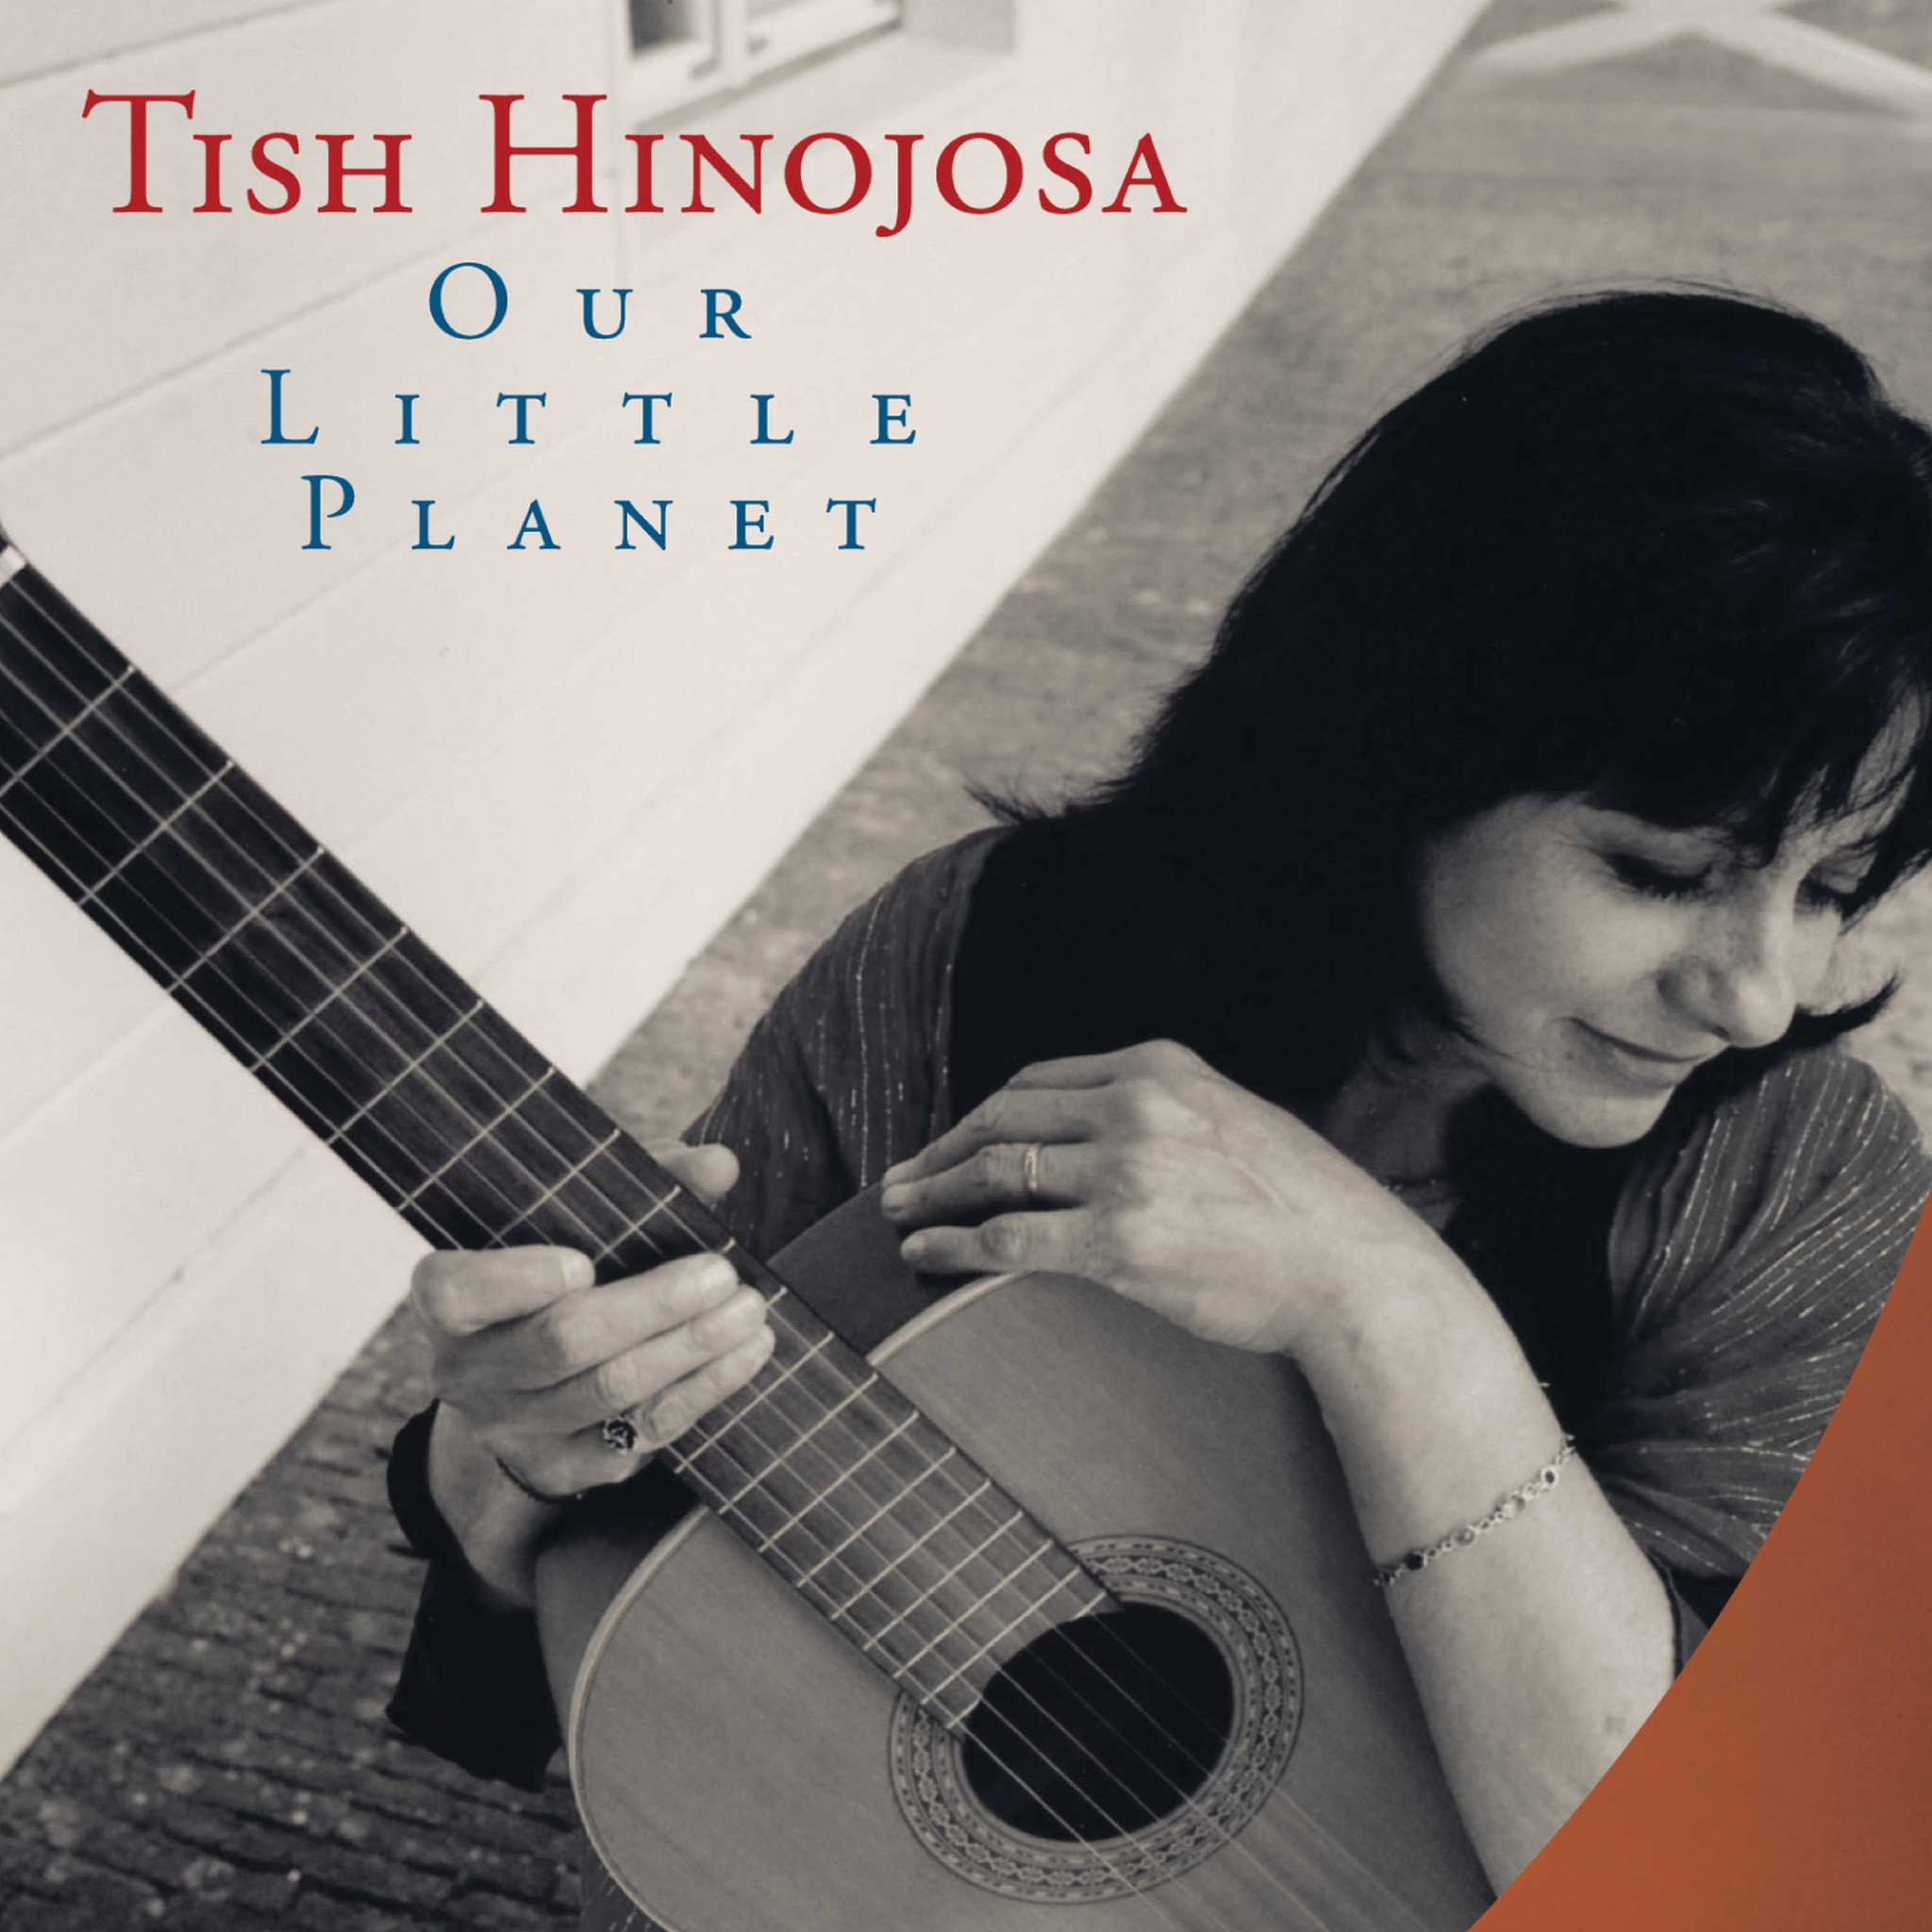 Tish Hinojosa-Our Little Planet - Tish Hinojosa-Our Little Planet - Musik - VARESE SARABANDE - 0030206696226 - May 26, 2009